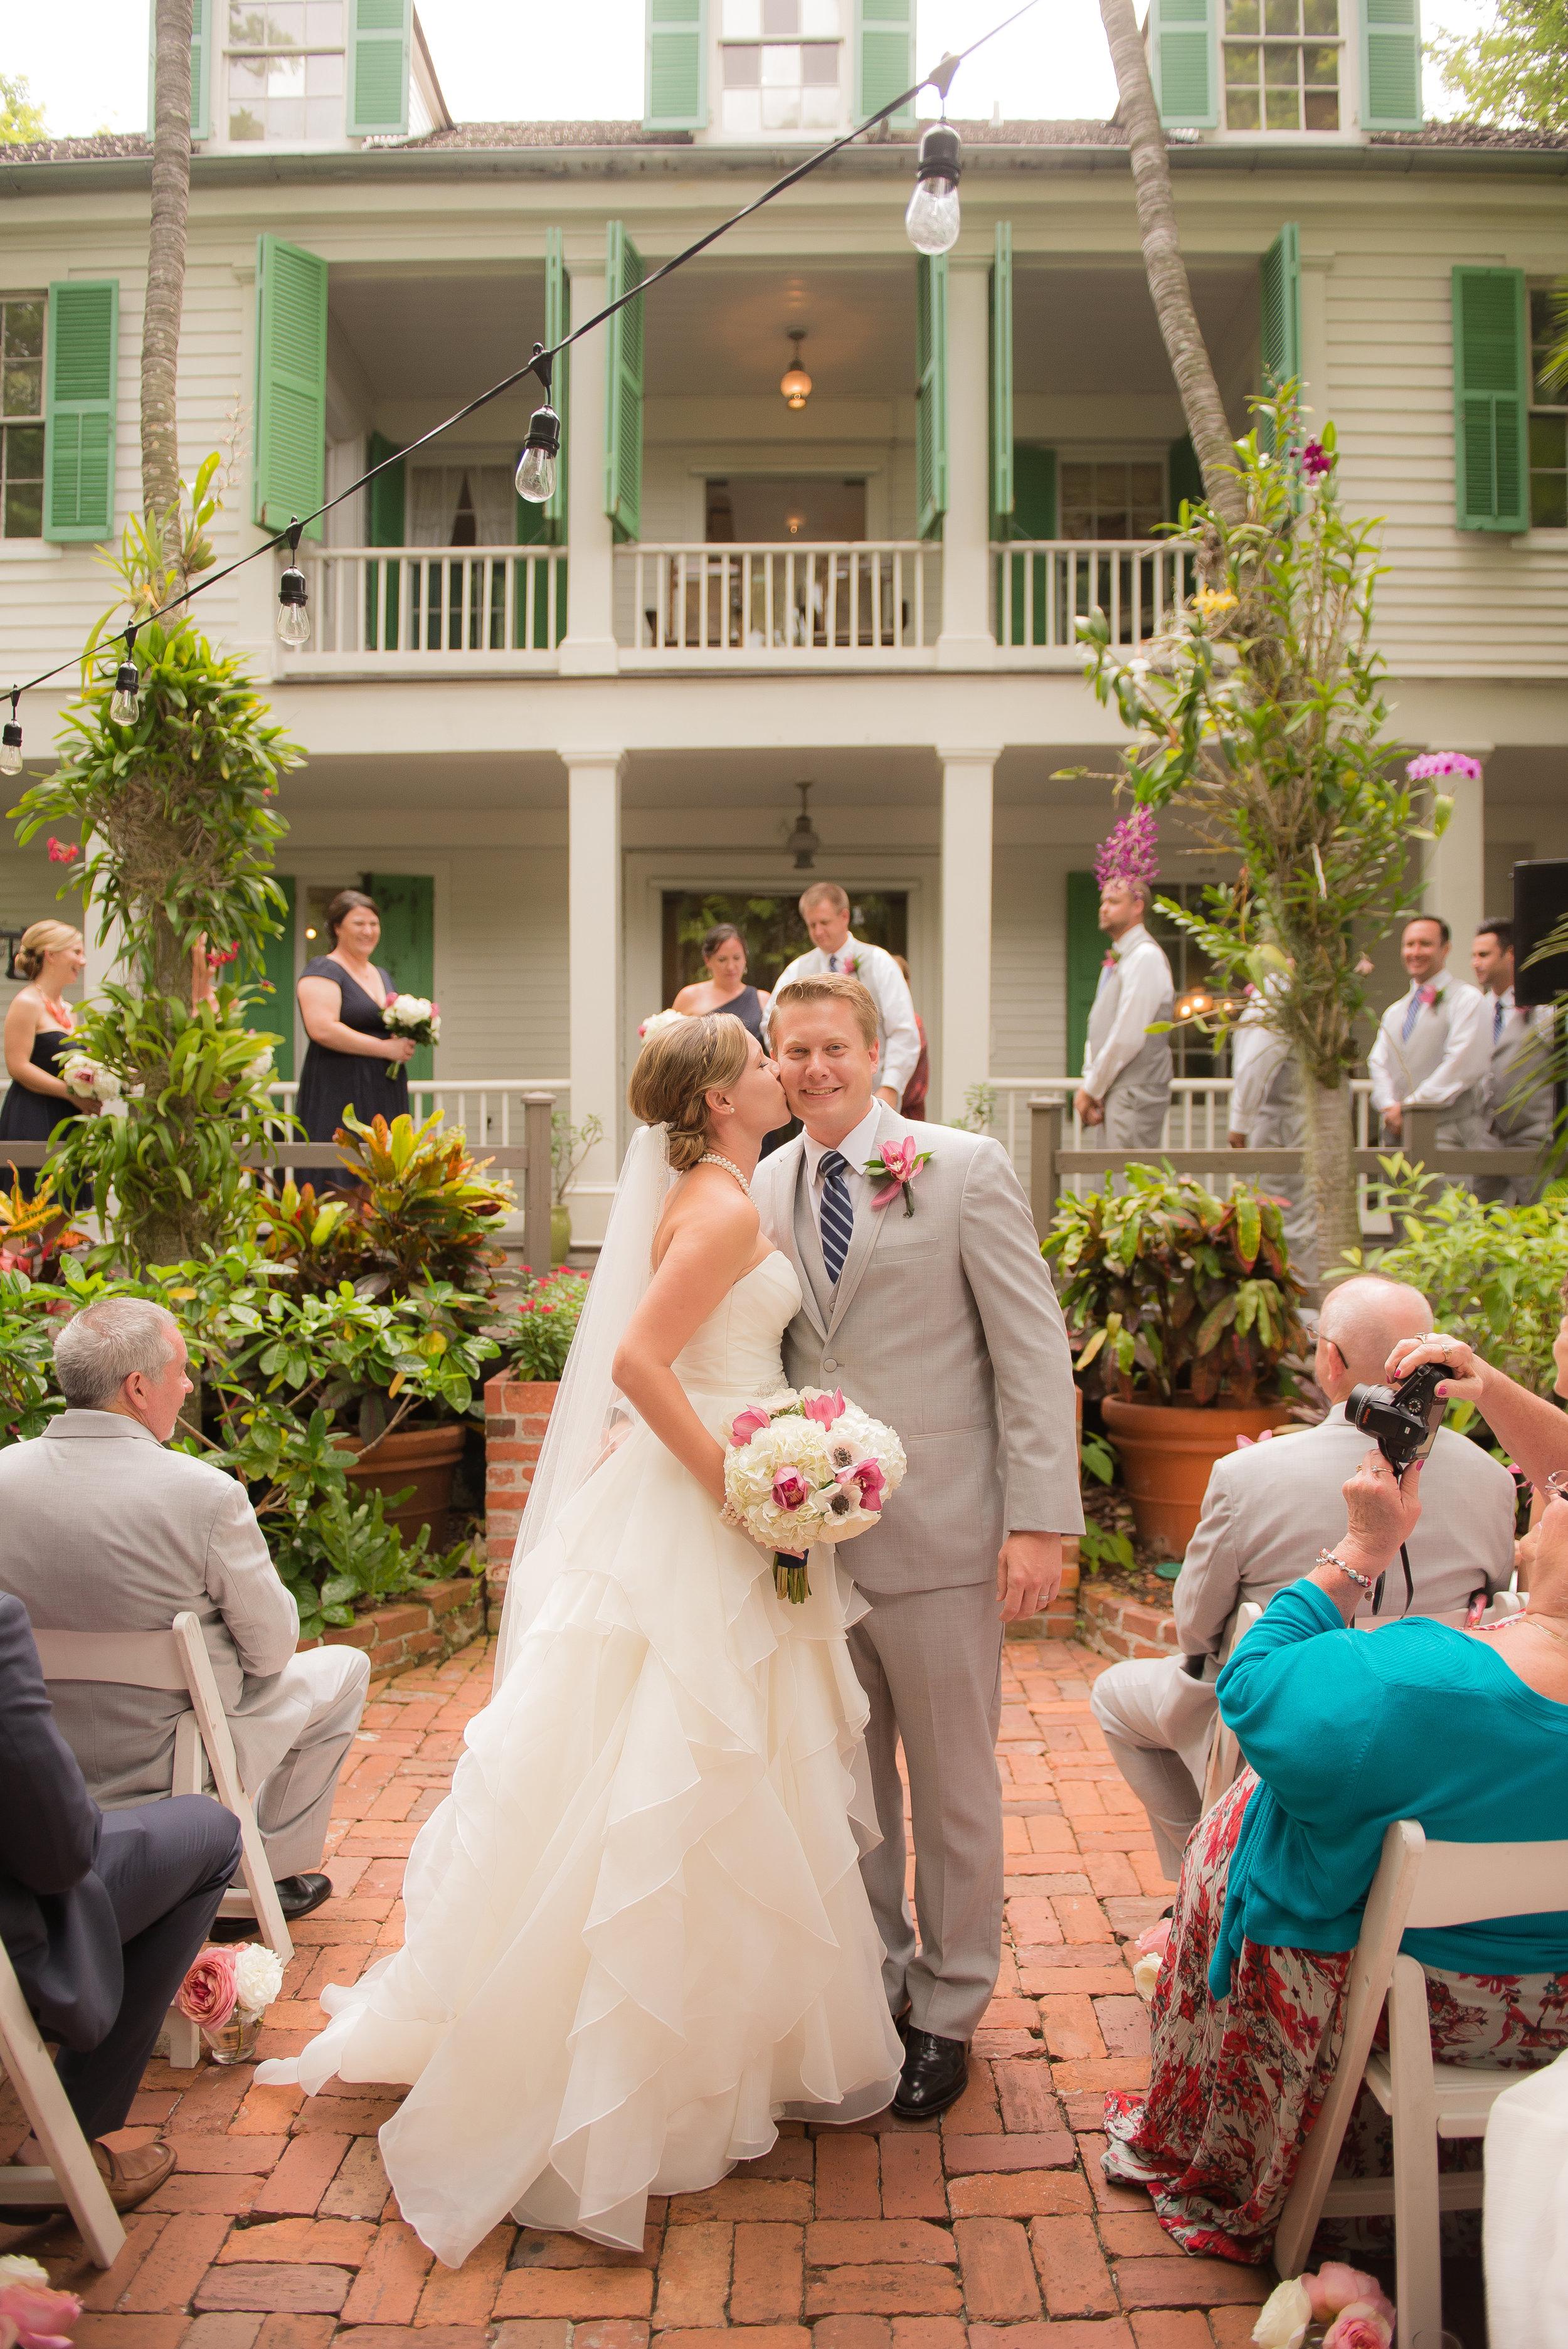 Amanda+James_Audubon House Key West Wedding34.jpg